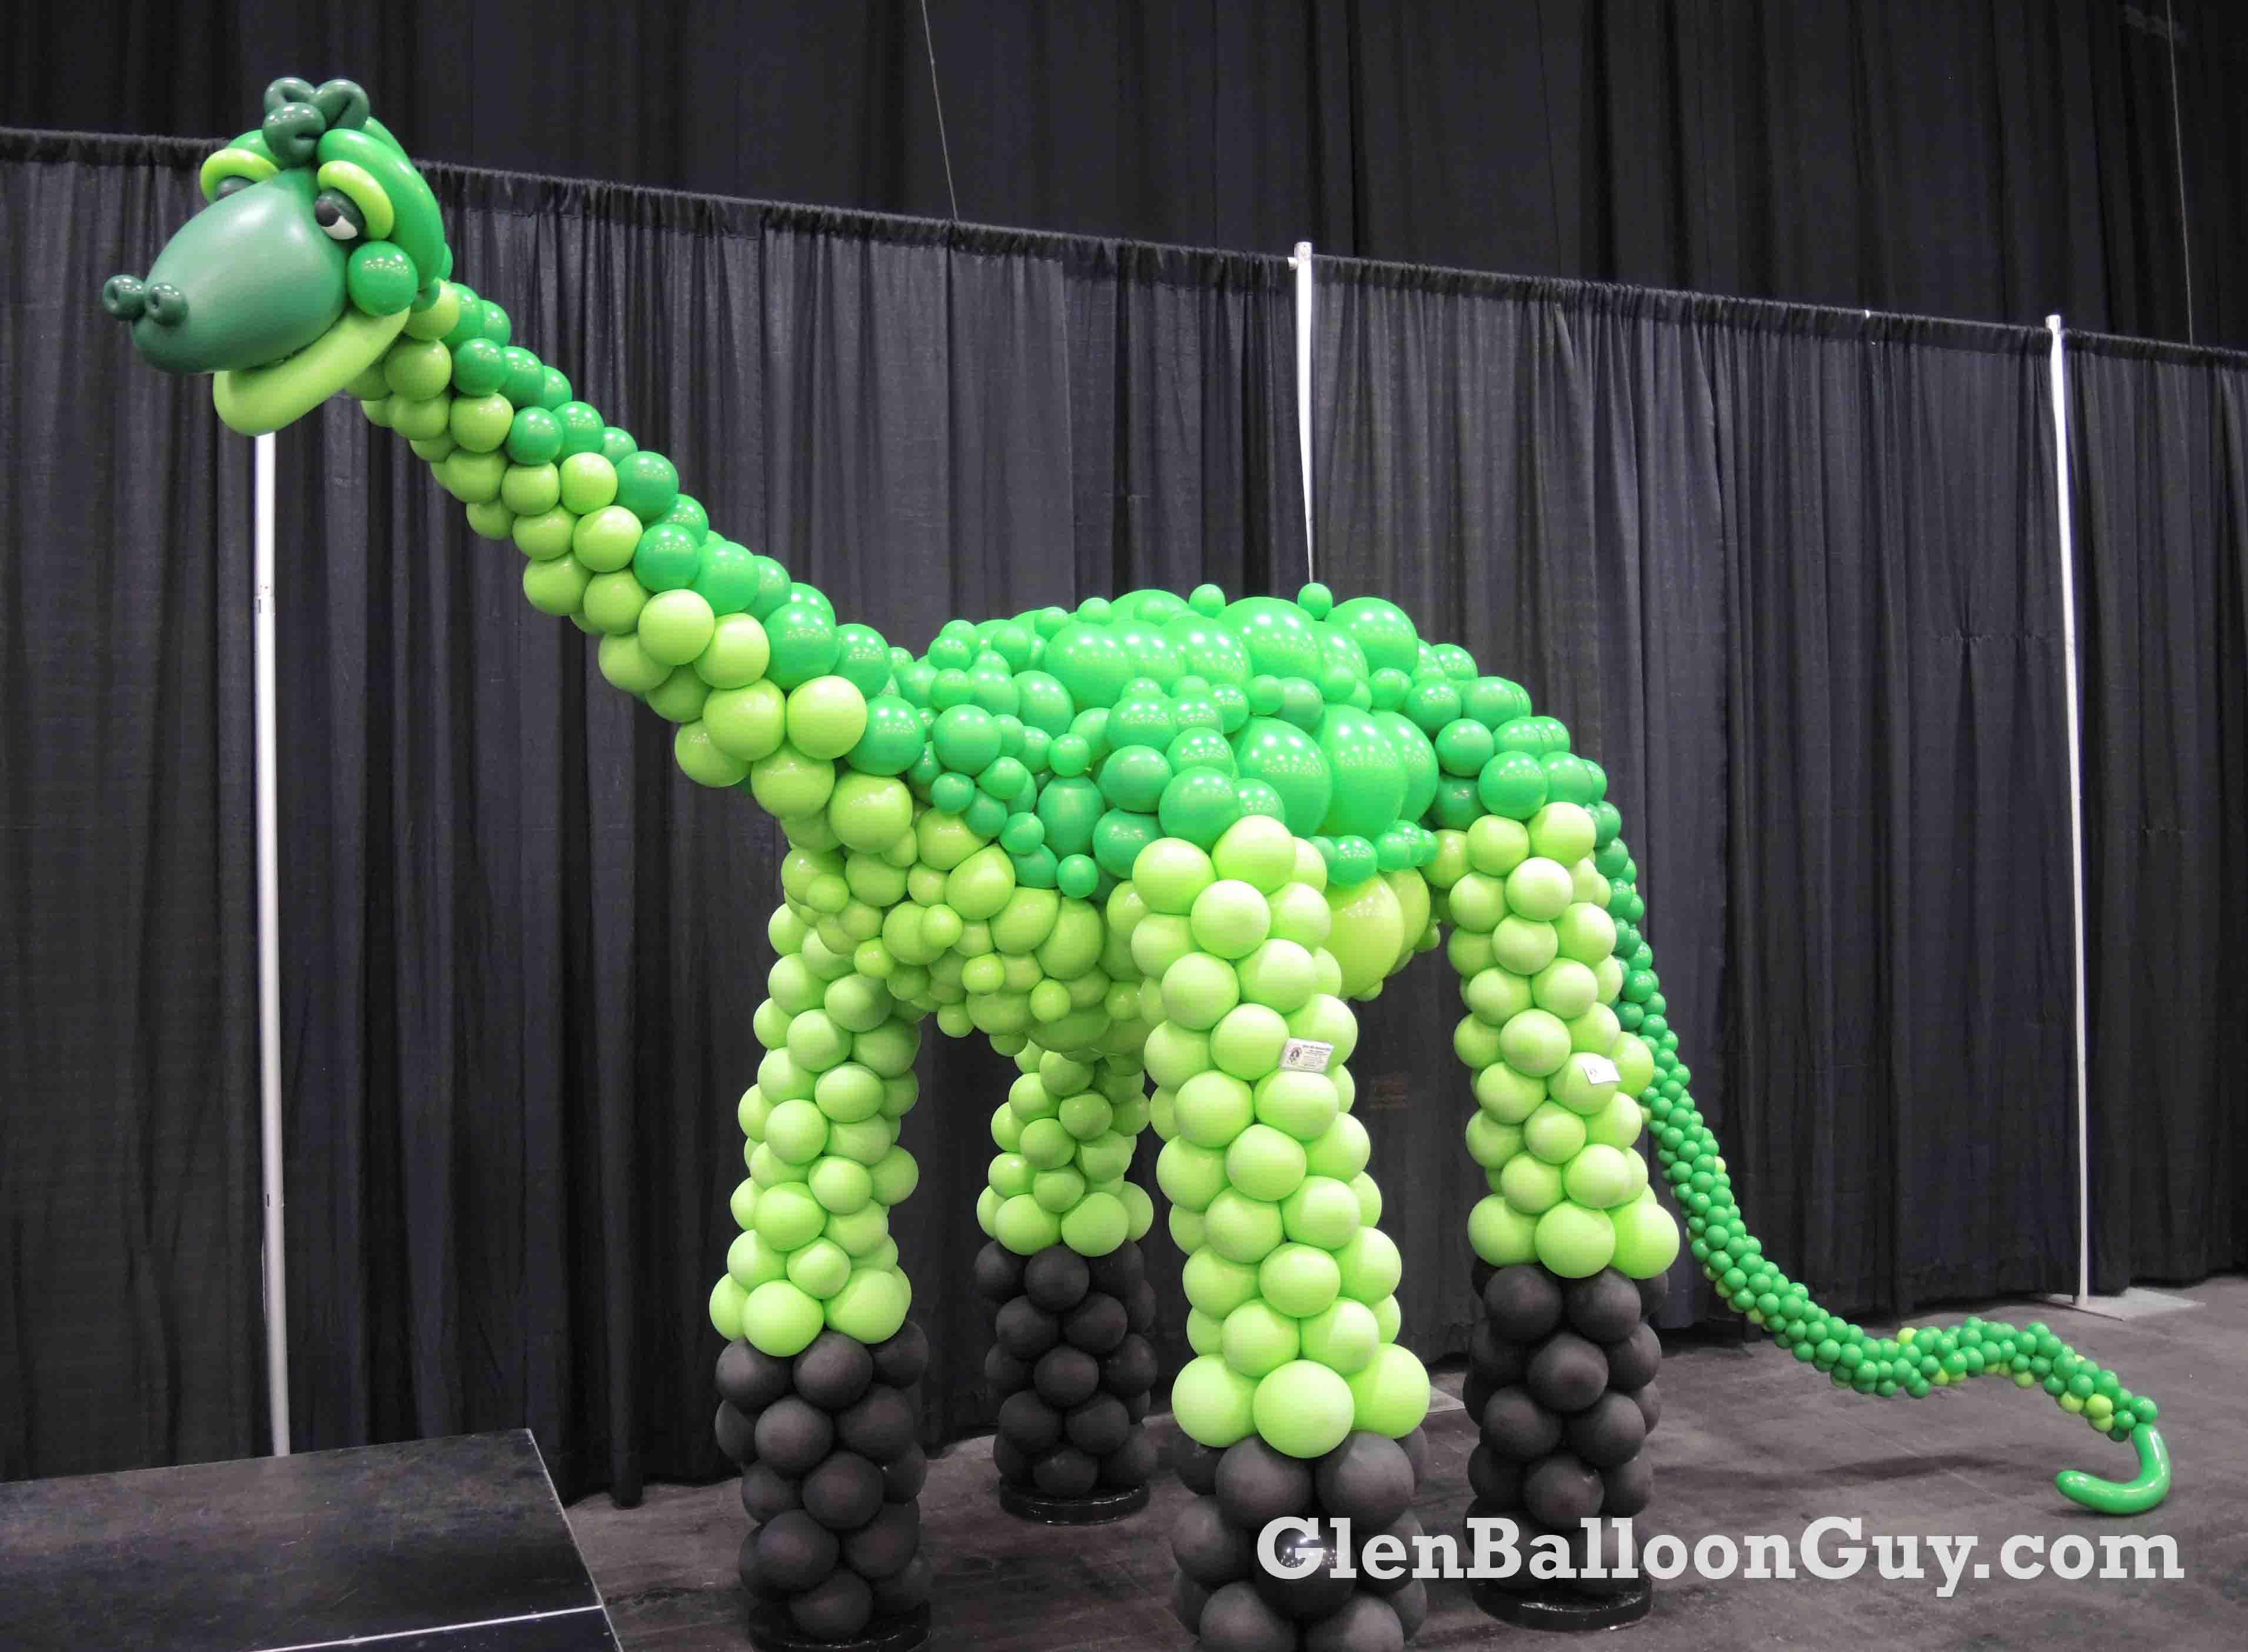 Big Balloon Dino - KDays 2018